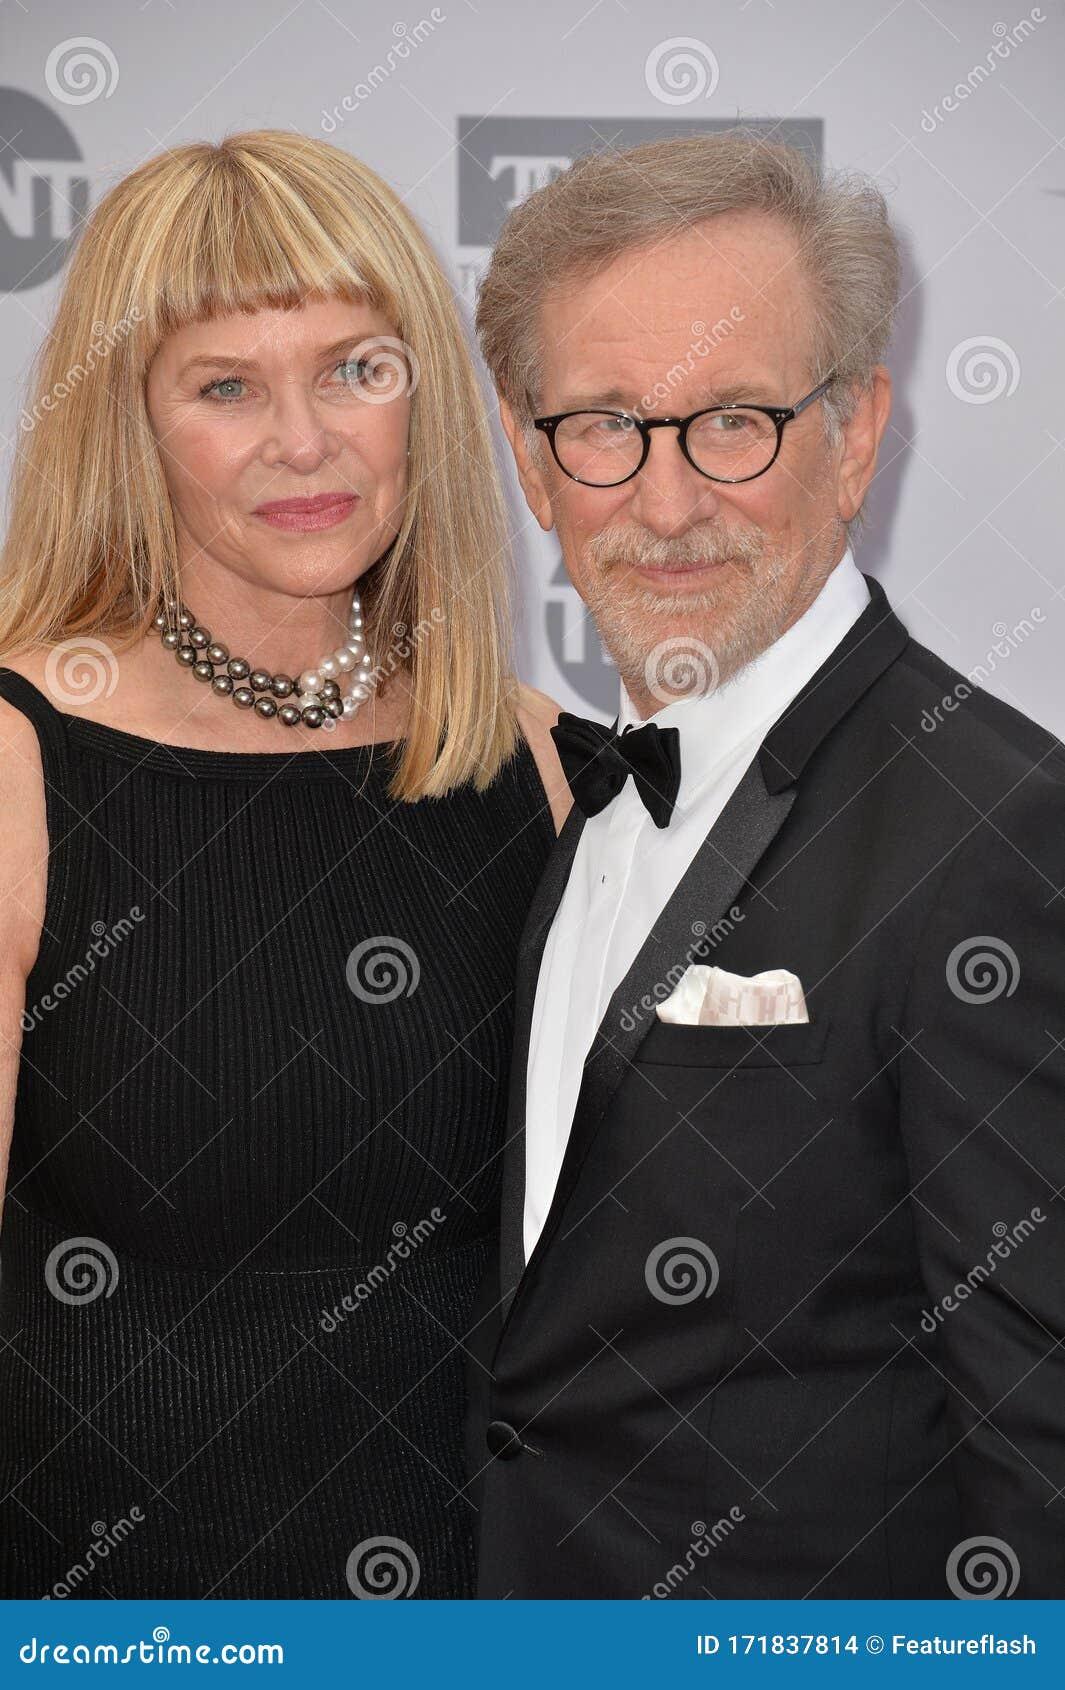 Steven Spielberg Kate Capshaw Editorial Stock Image Image Of Popular Black 171837814